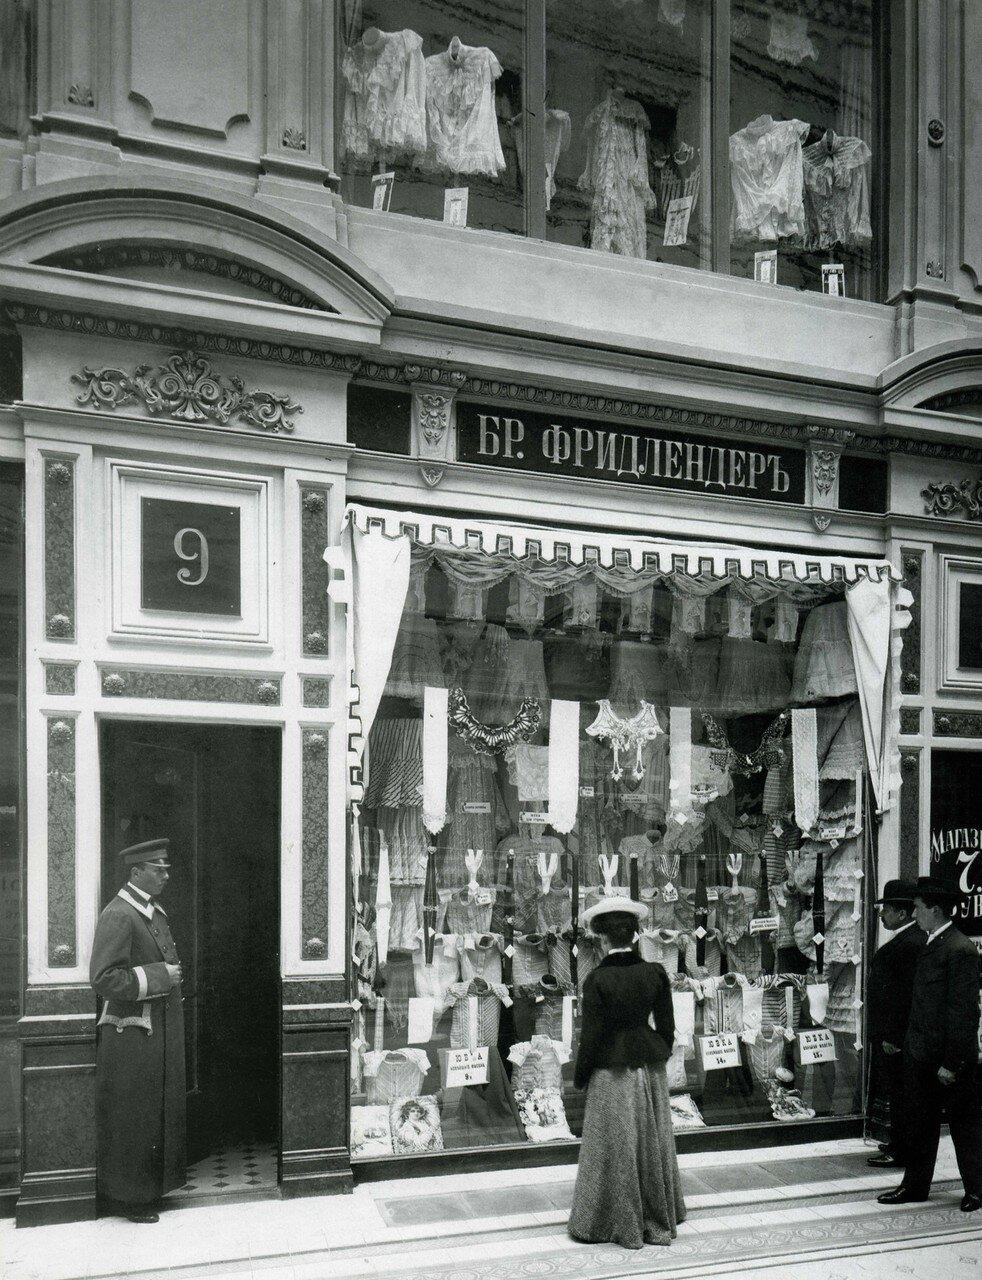 Витрина магазина «Бр.Фридлендер» (Невский пр.,48, Пассаж)